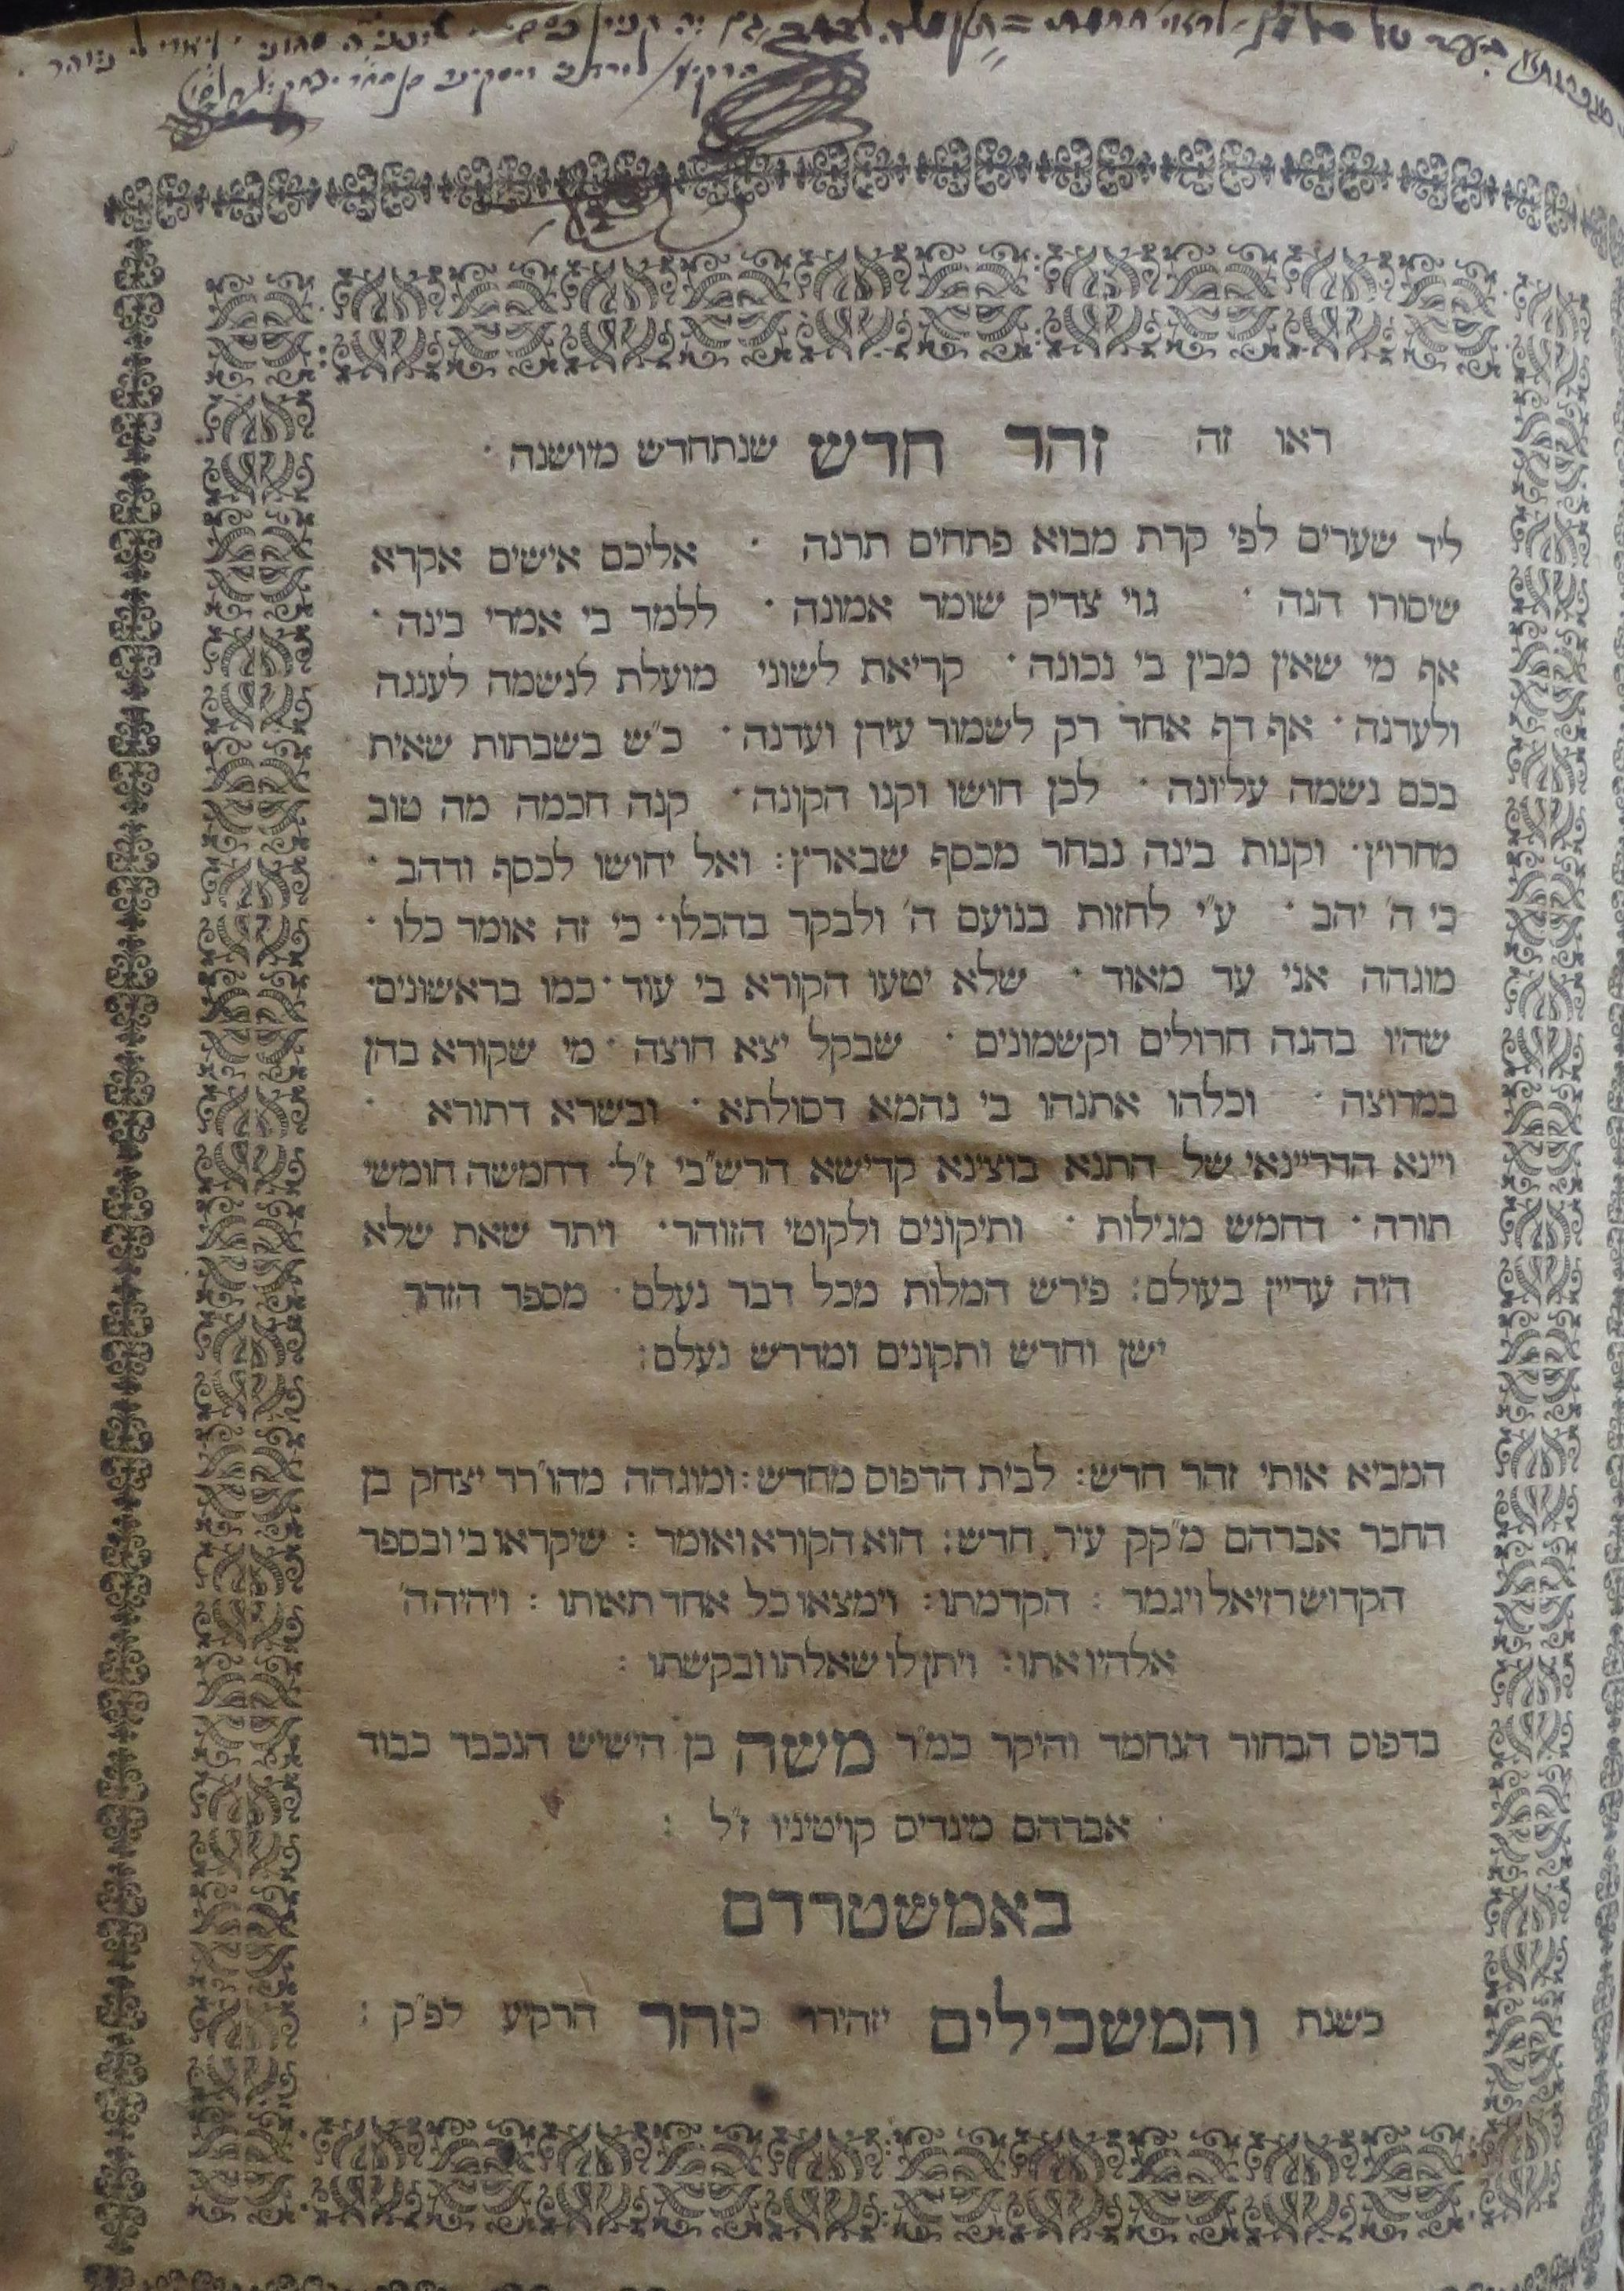 ZOHAR HADASH (NEUSTADT, Isaac b. Abraham)